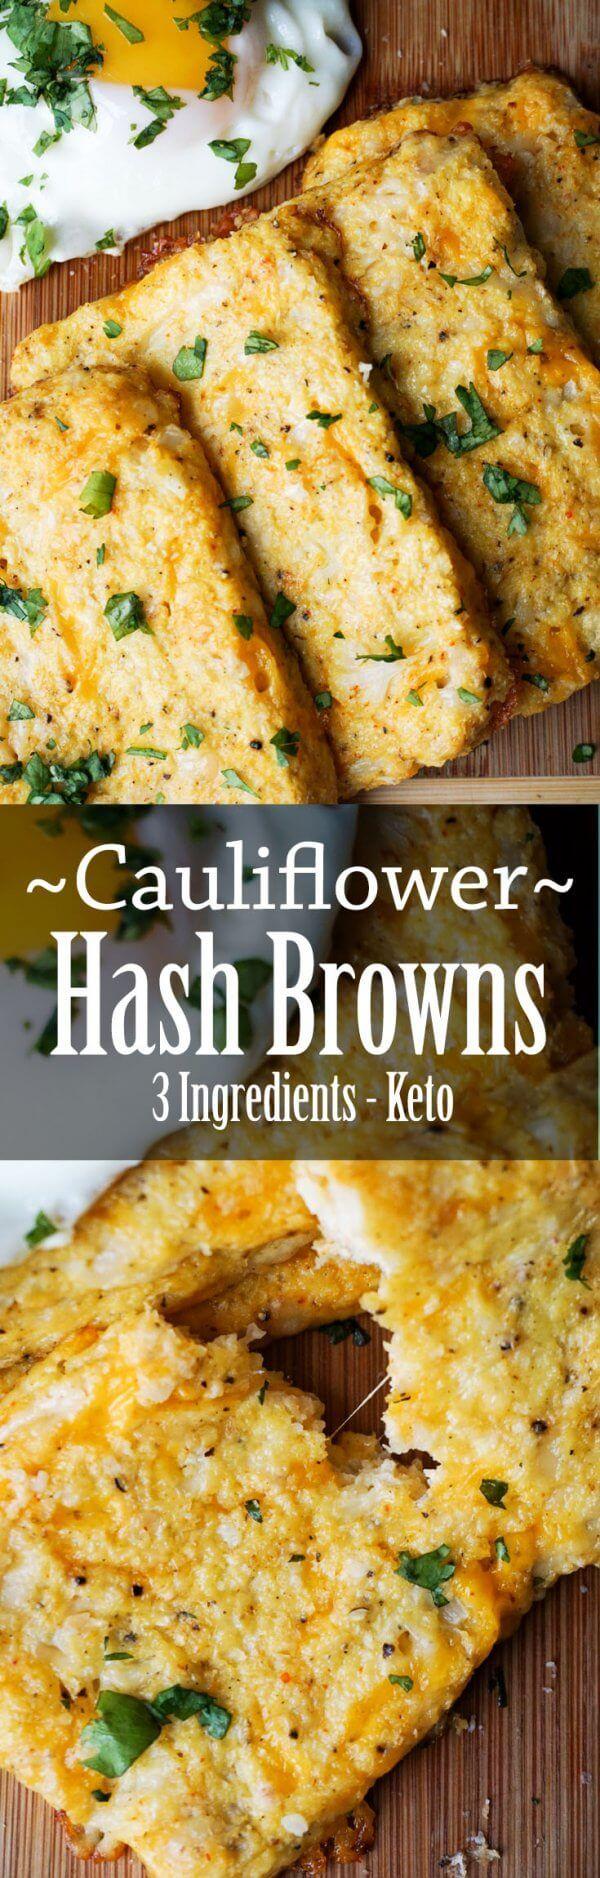 Cauliflower Hash Browns bursting with cheese! Keto breakfast taken to the next level!